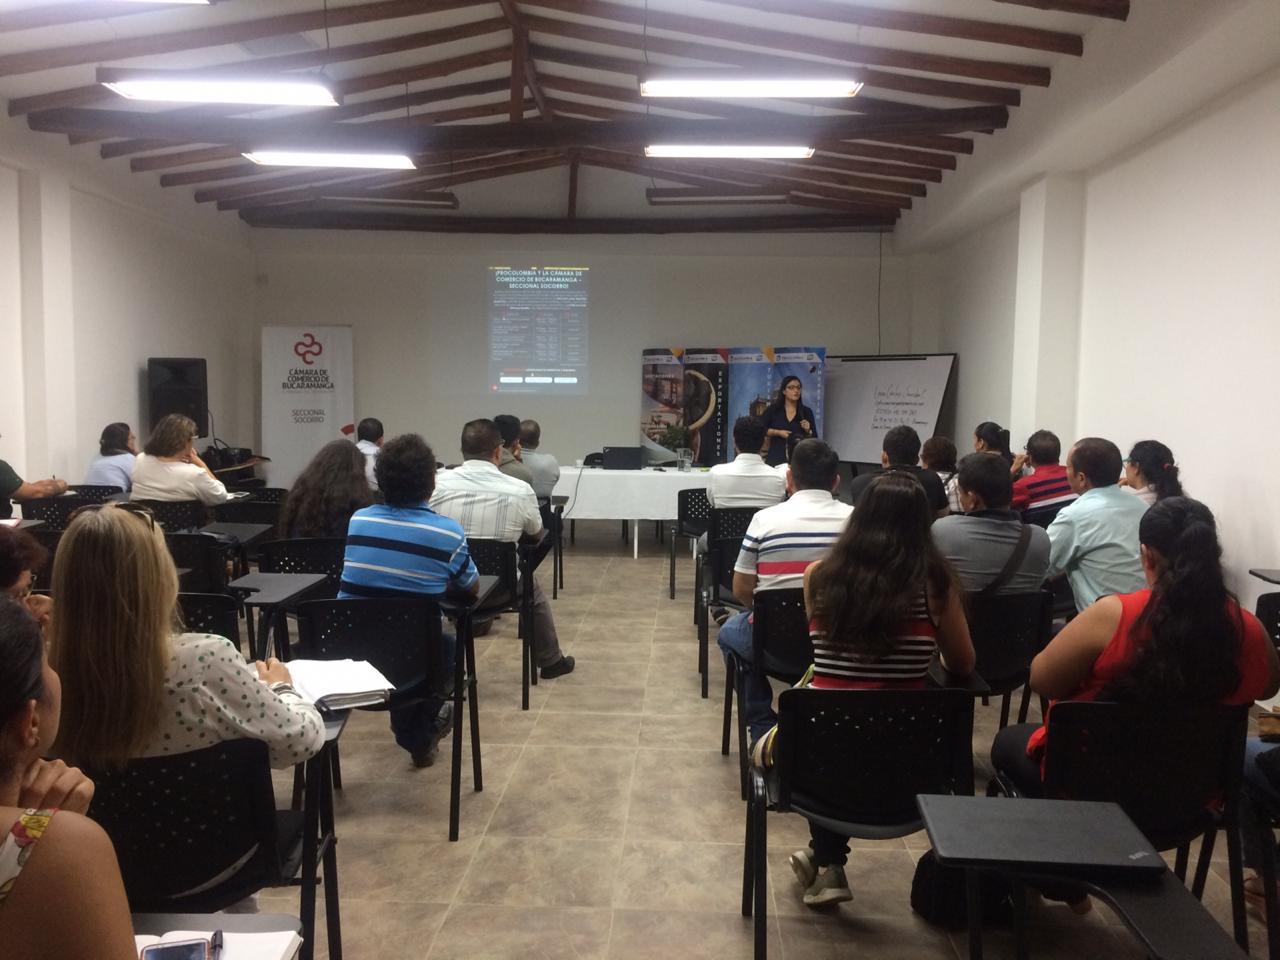 Asesorías de Cámara de Comercio de Bucaramanga. Internacionalización para empresarios de Provincia | Local | Economía | EL FRENTE